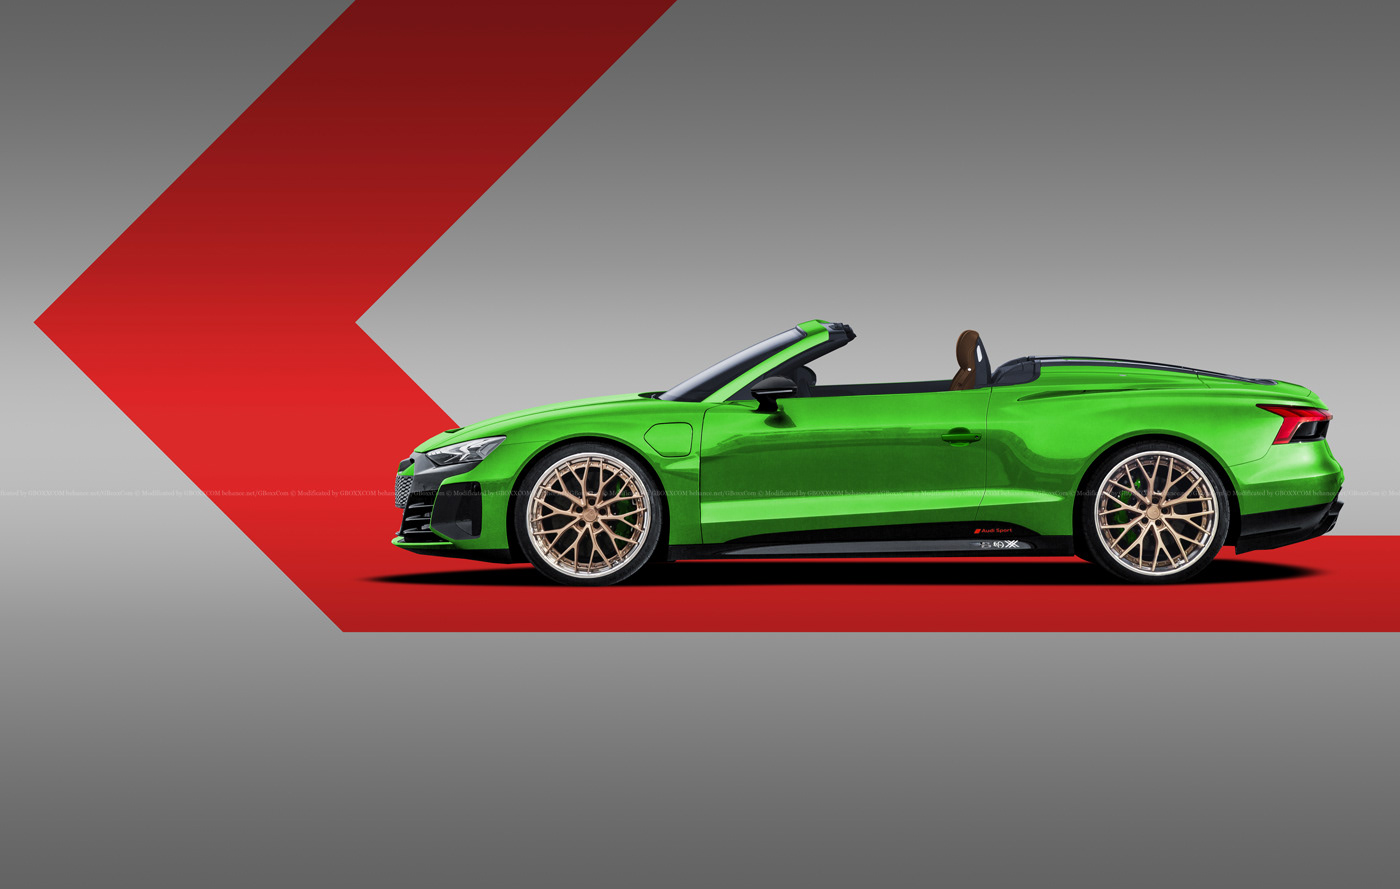 Audi E-Tron GT Spyder, E-Tron GT Wagon, E-Tron GT Coupe Renderings (4)